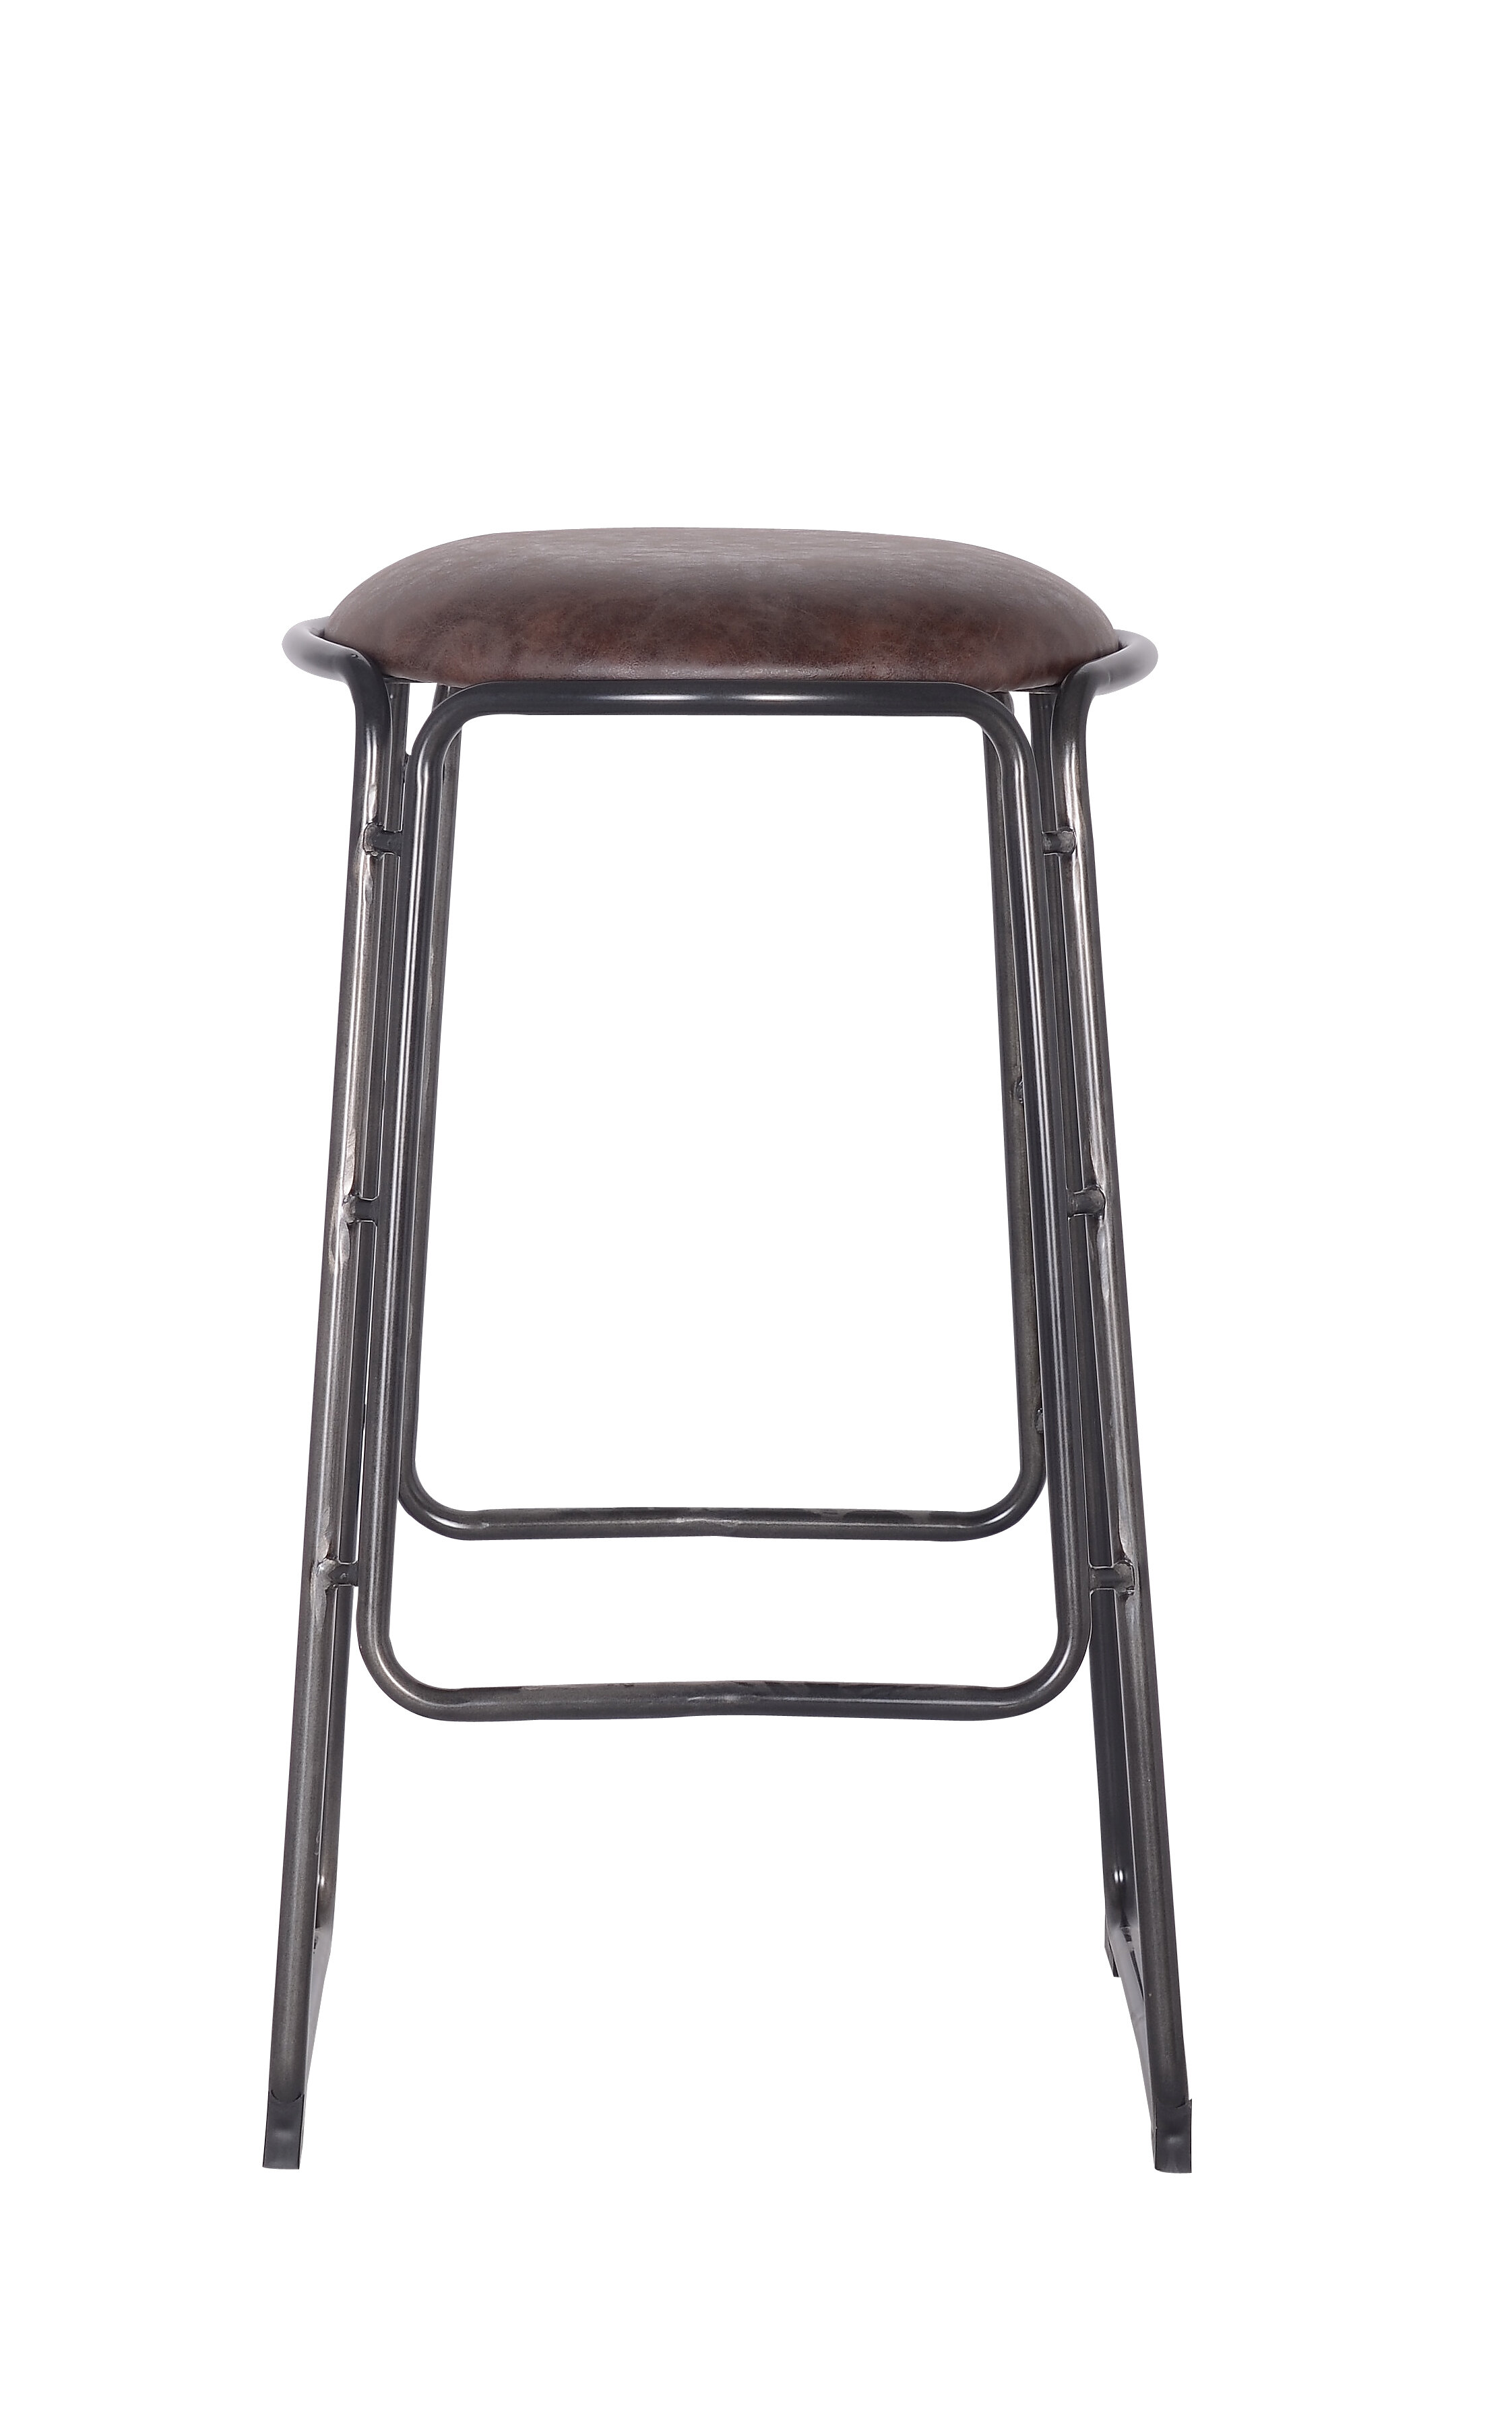 Stupendous Swenson Metal Powder Coating 30 Bar Stool Evergreenethics Interior Chair Design Evergreenethicsorg